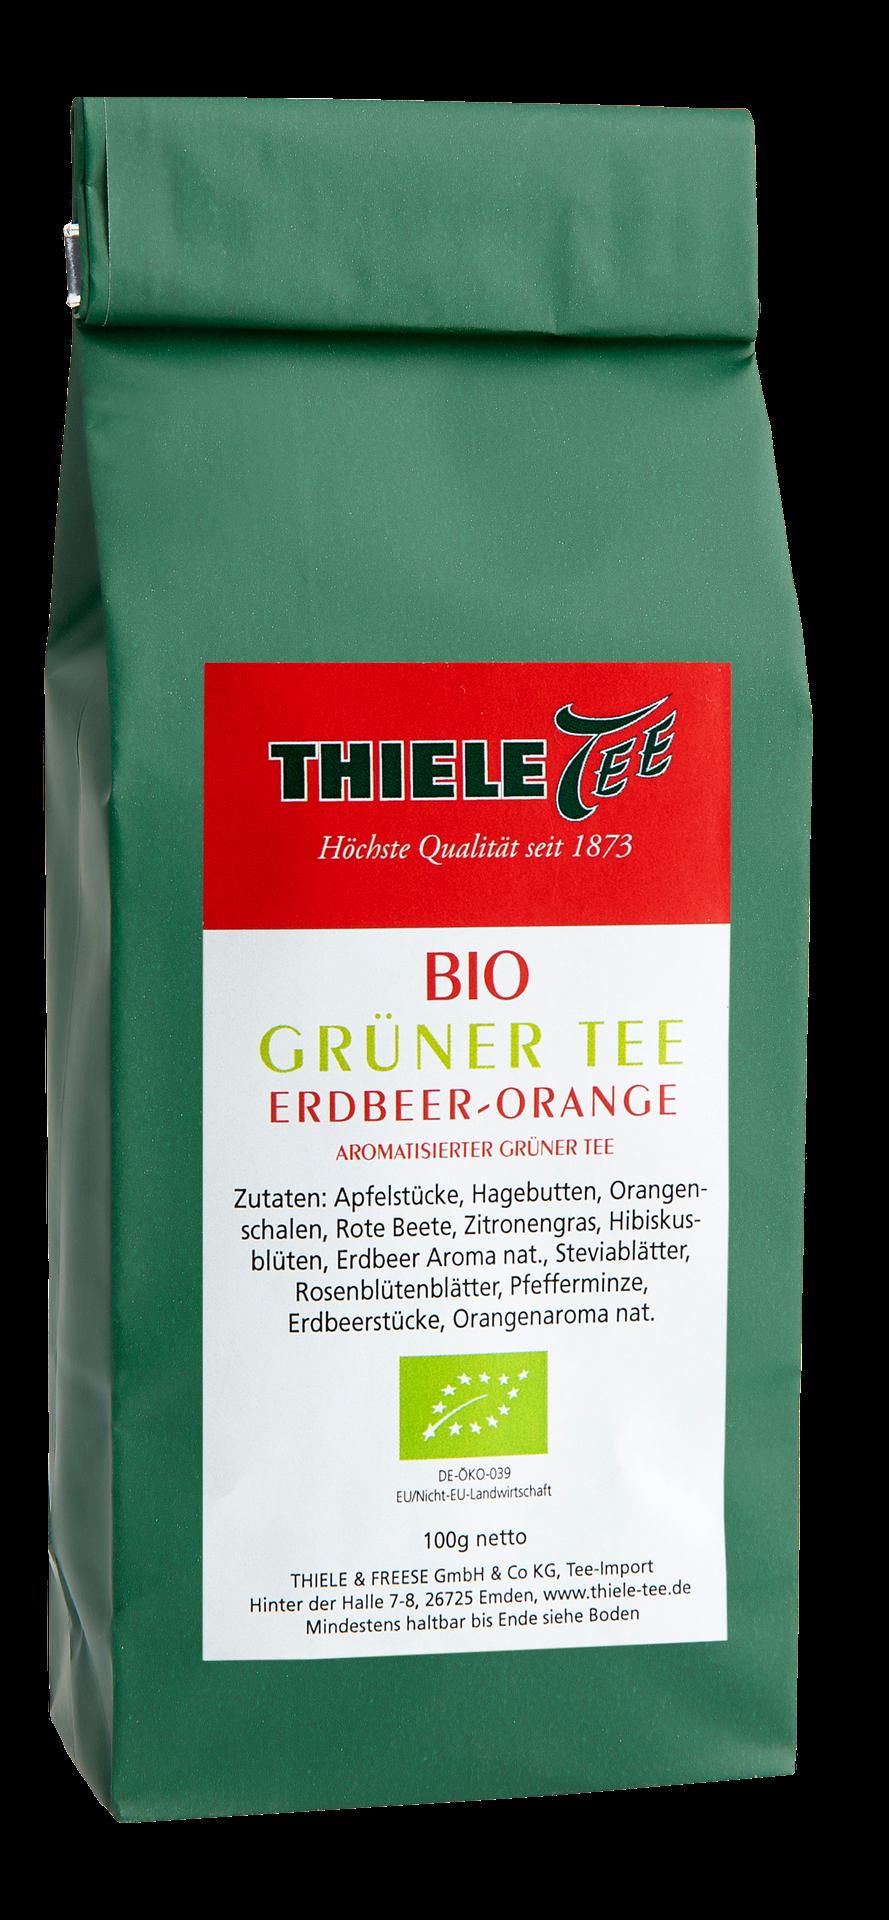 BIO Grüner Tee Erdbeer-Orange 100g